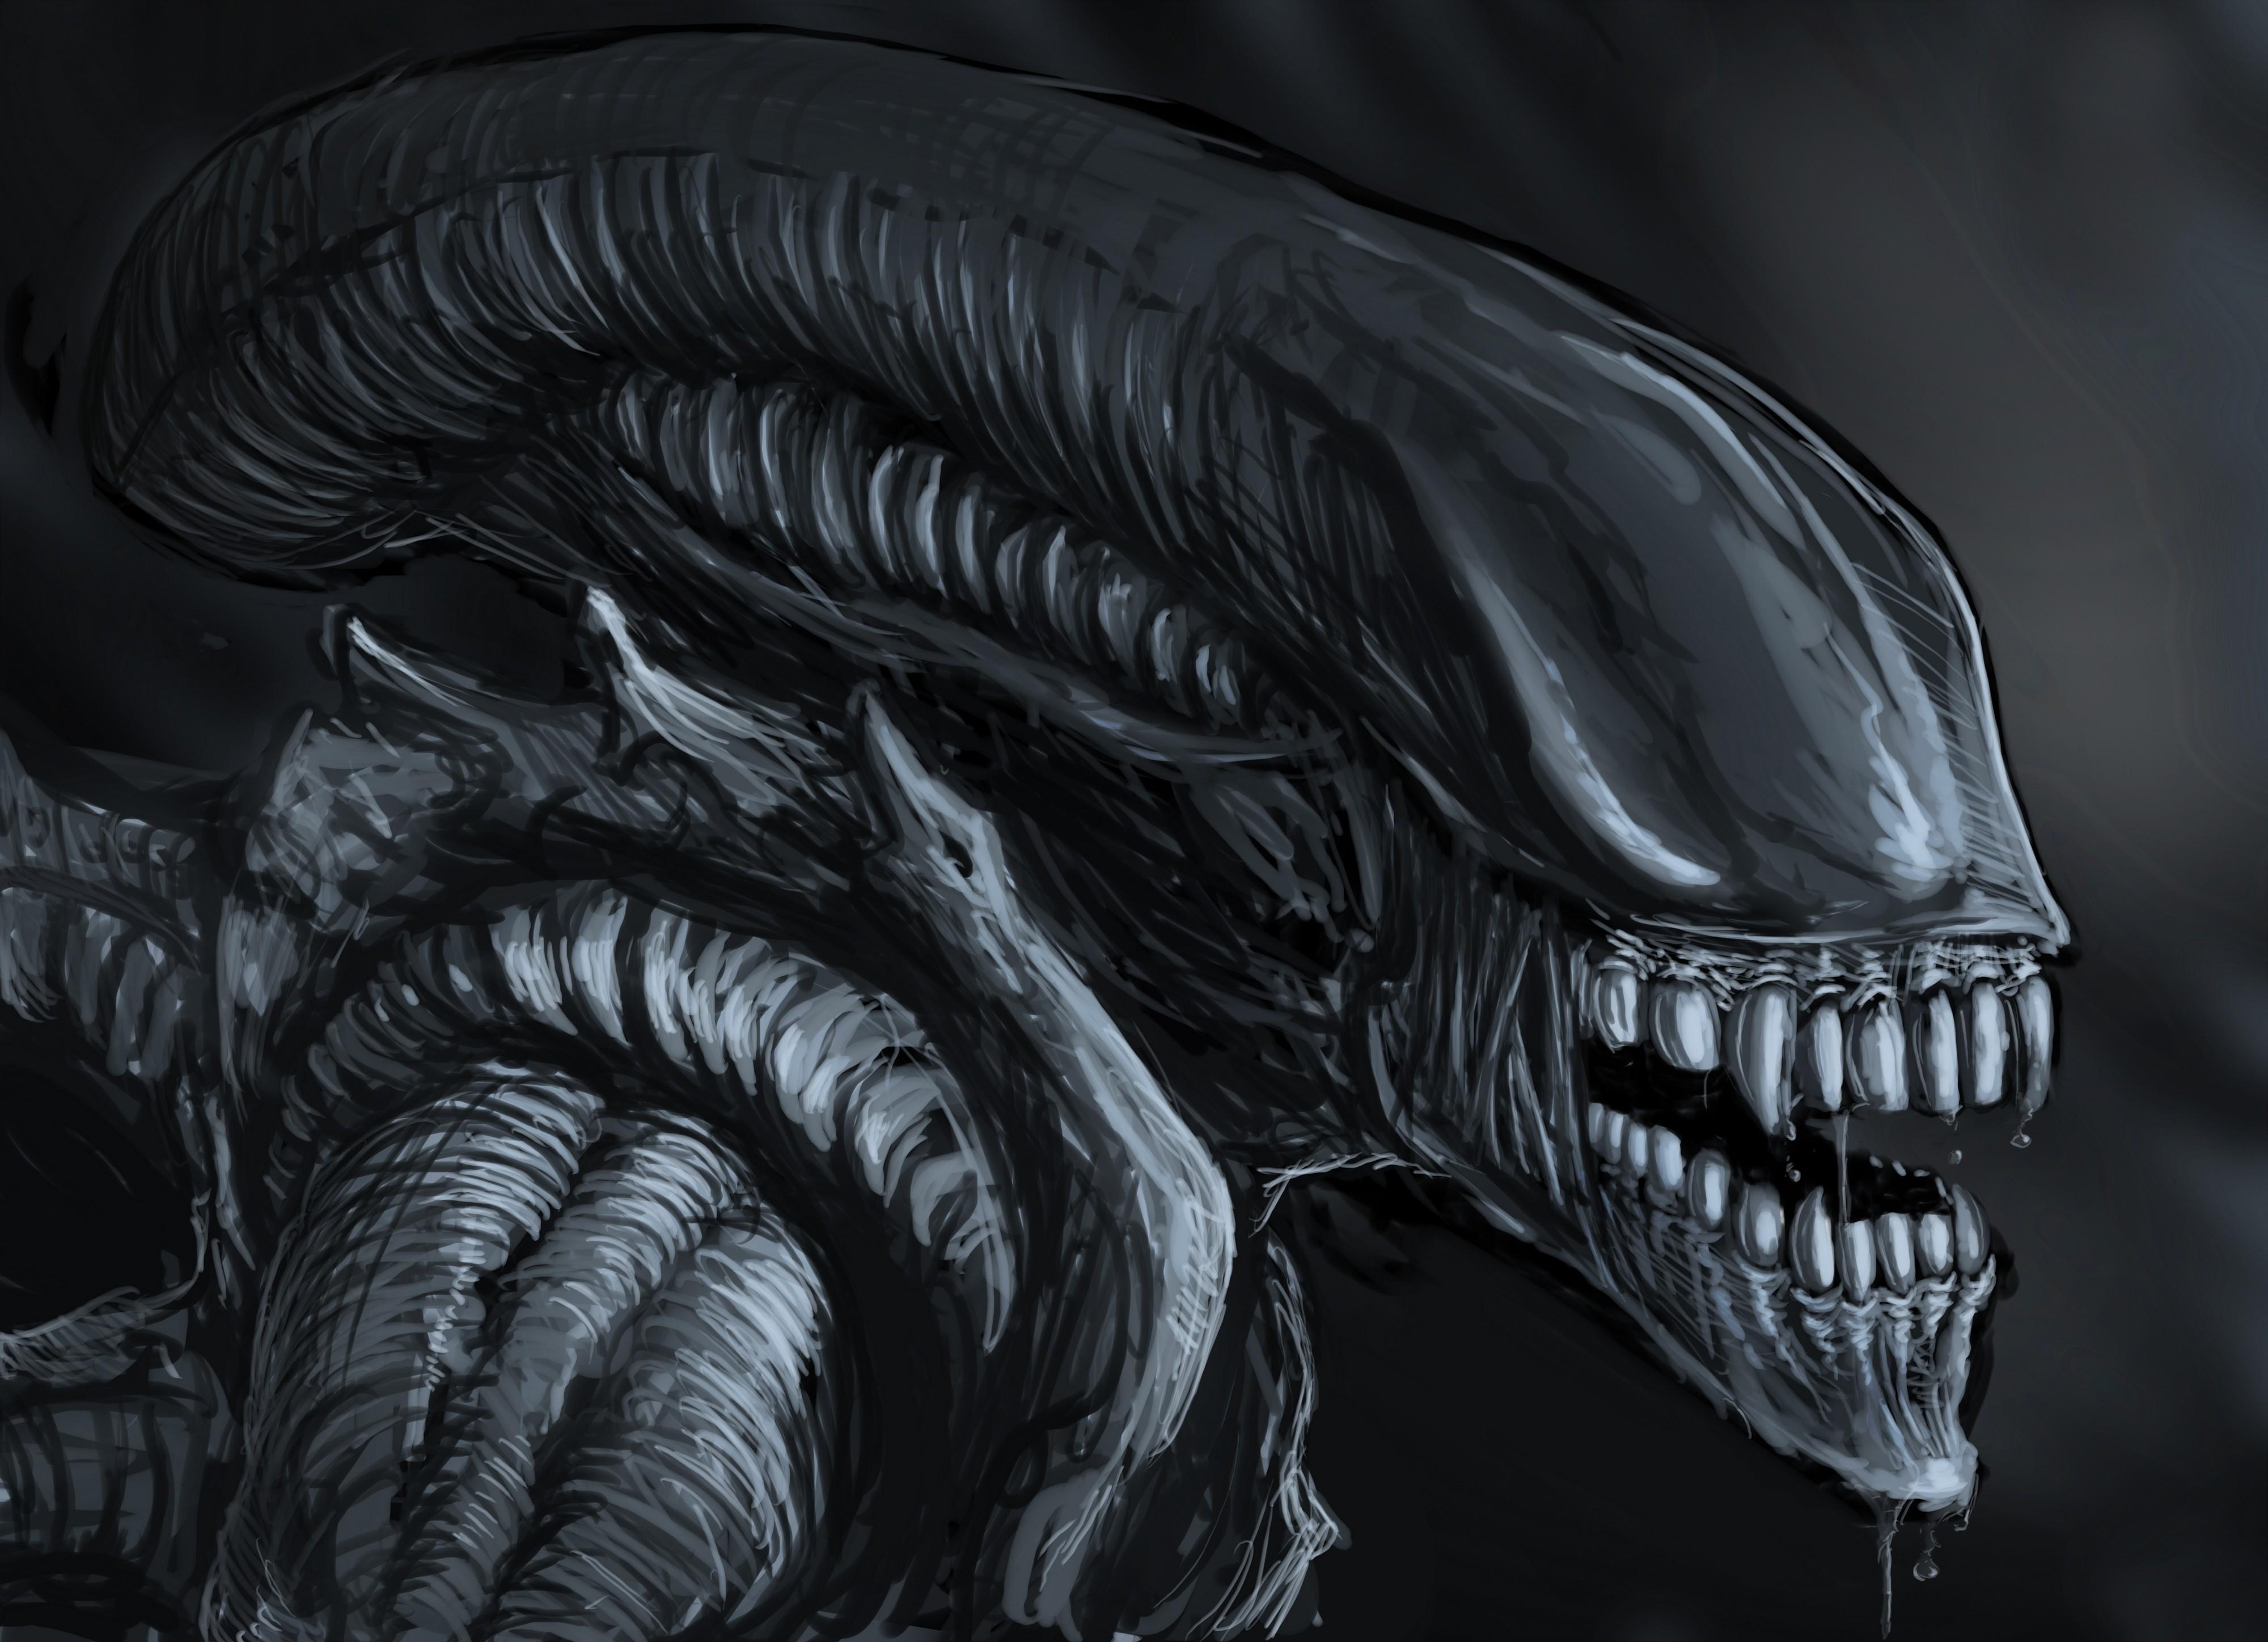 Wallpaper : drawing, illustration, artwork, Xenomorph, Alien